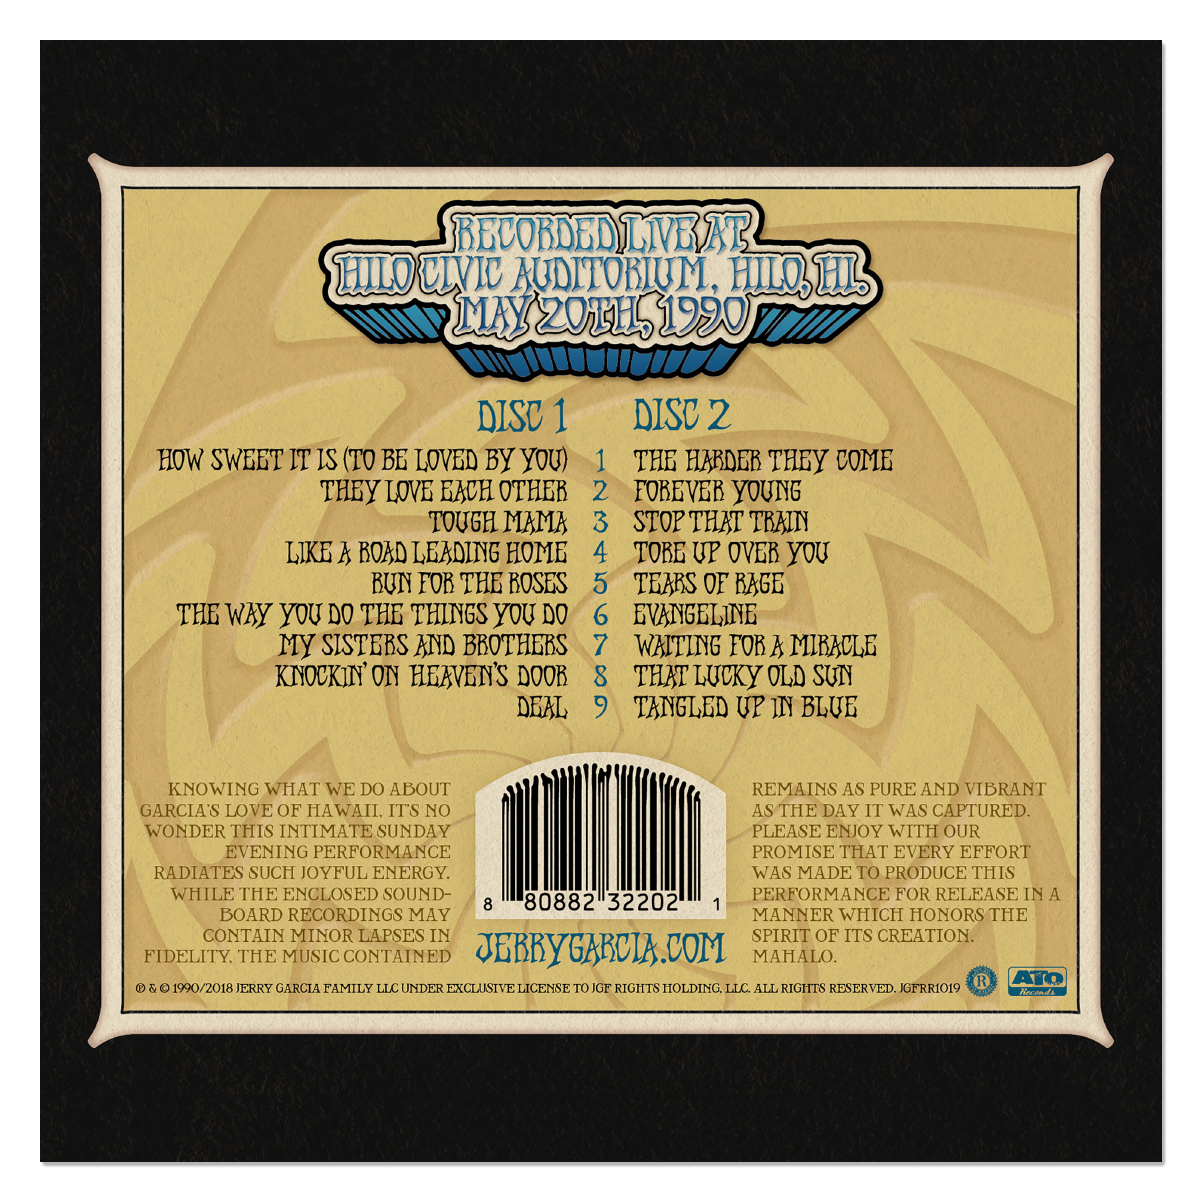 Jerry Garcia Band: GarciaLive Volume 10: Digital Download & Organic T-Shirt Bundle